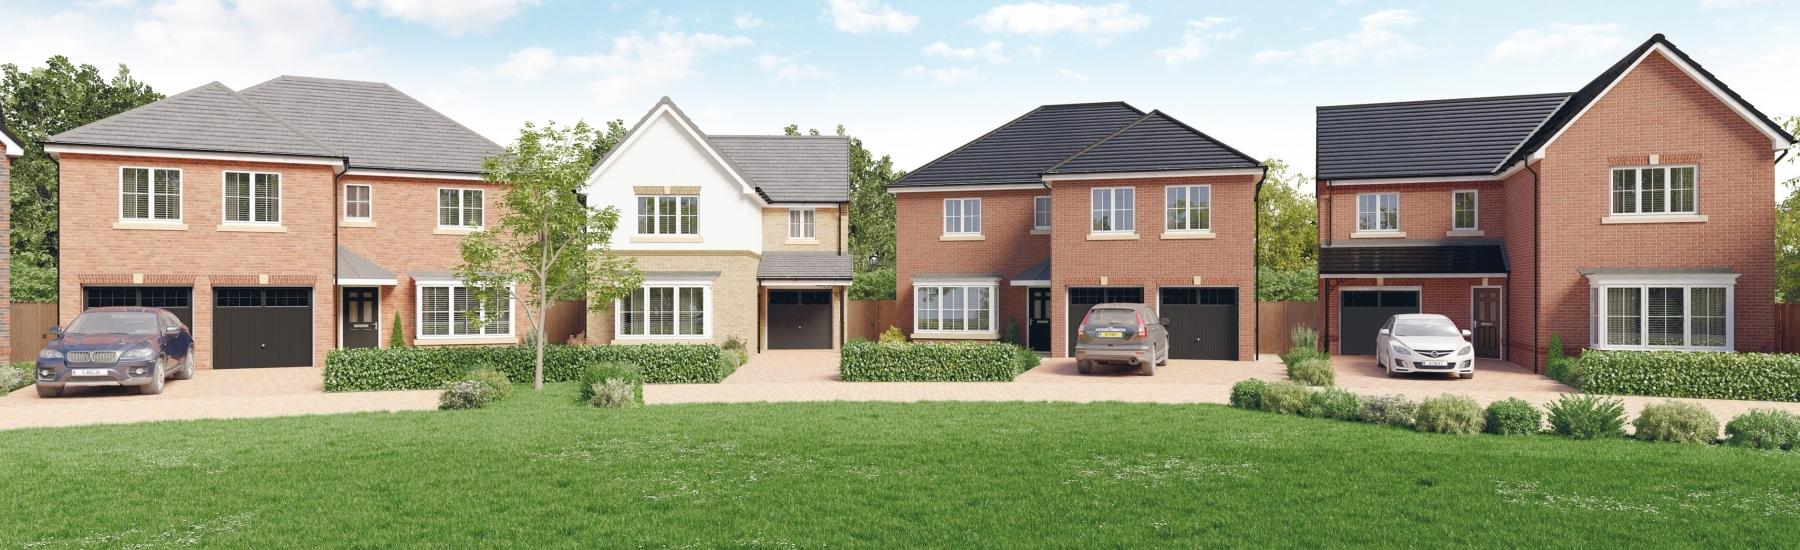 New build homes Newcastle upon Tyne UK 2 5 Bedroom